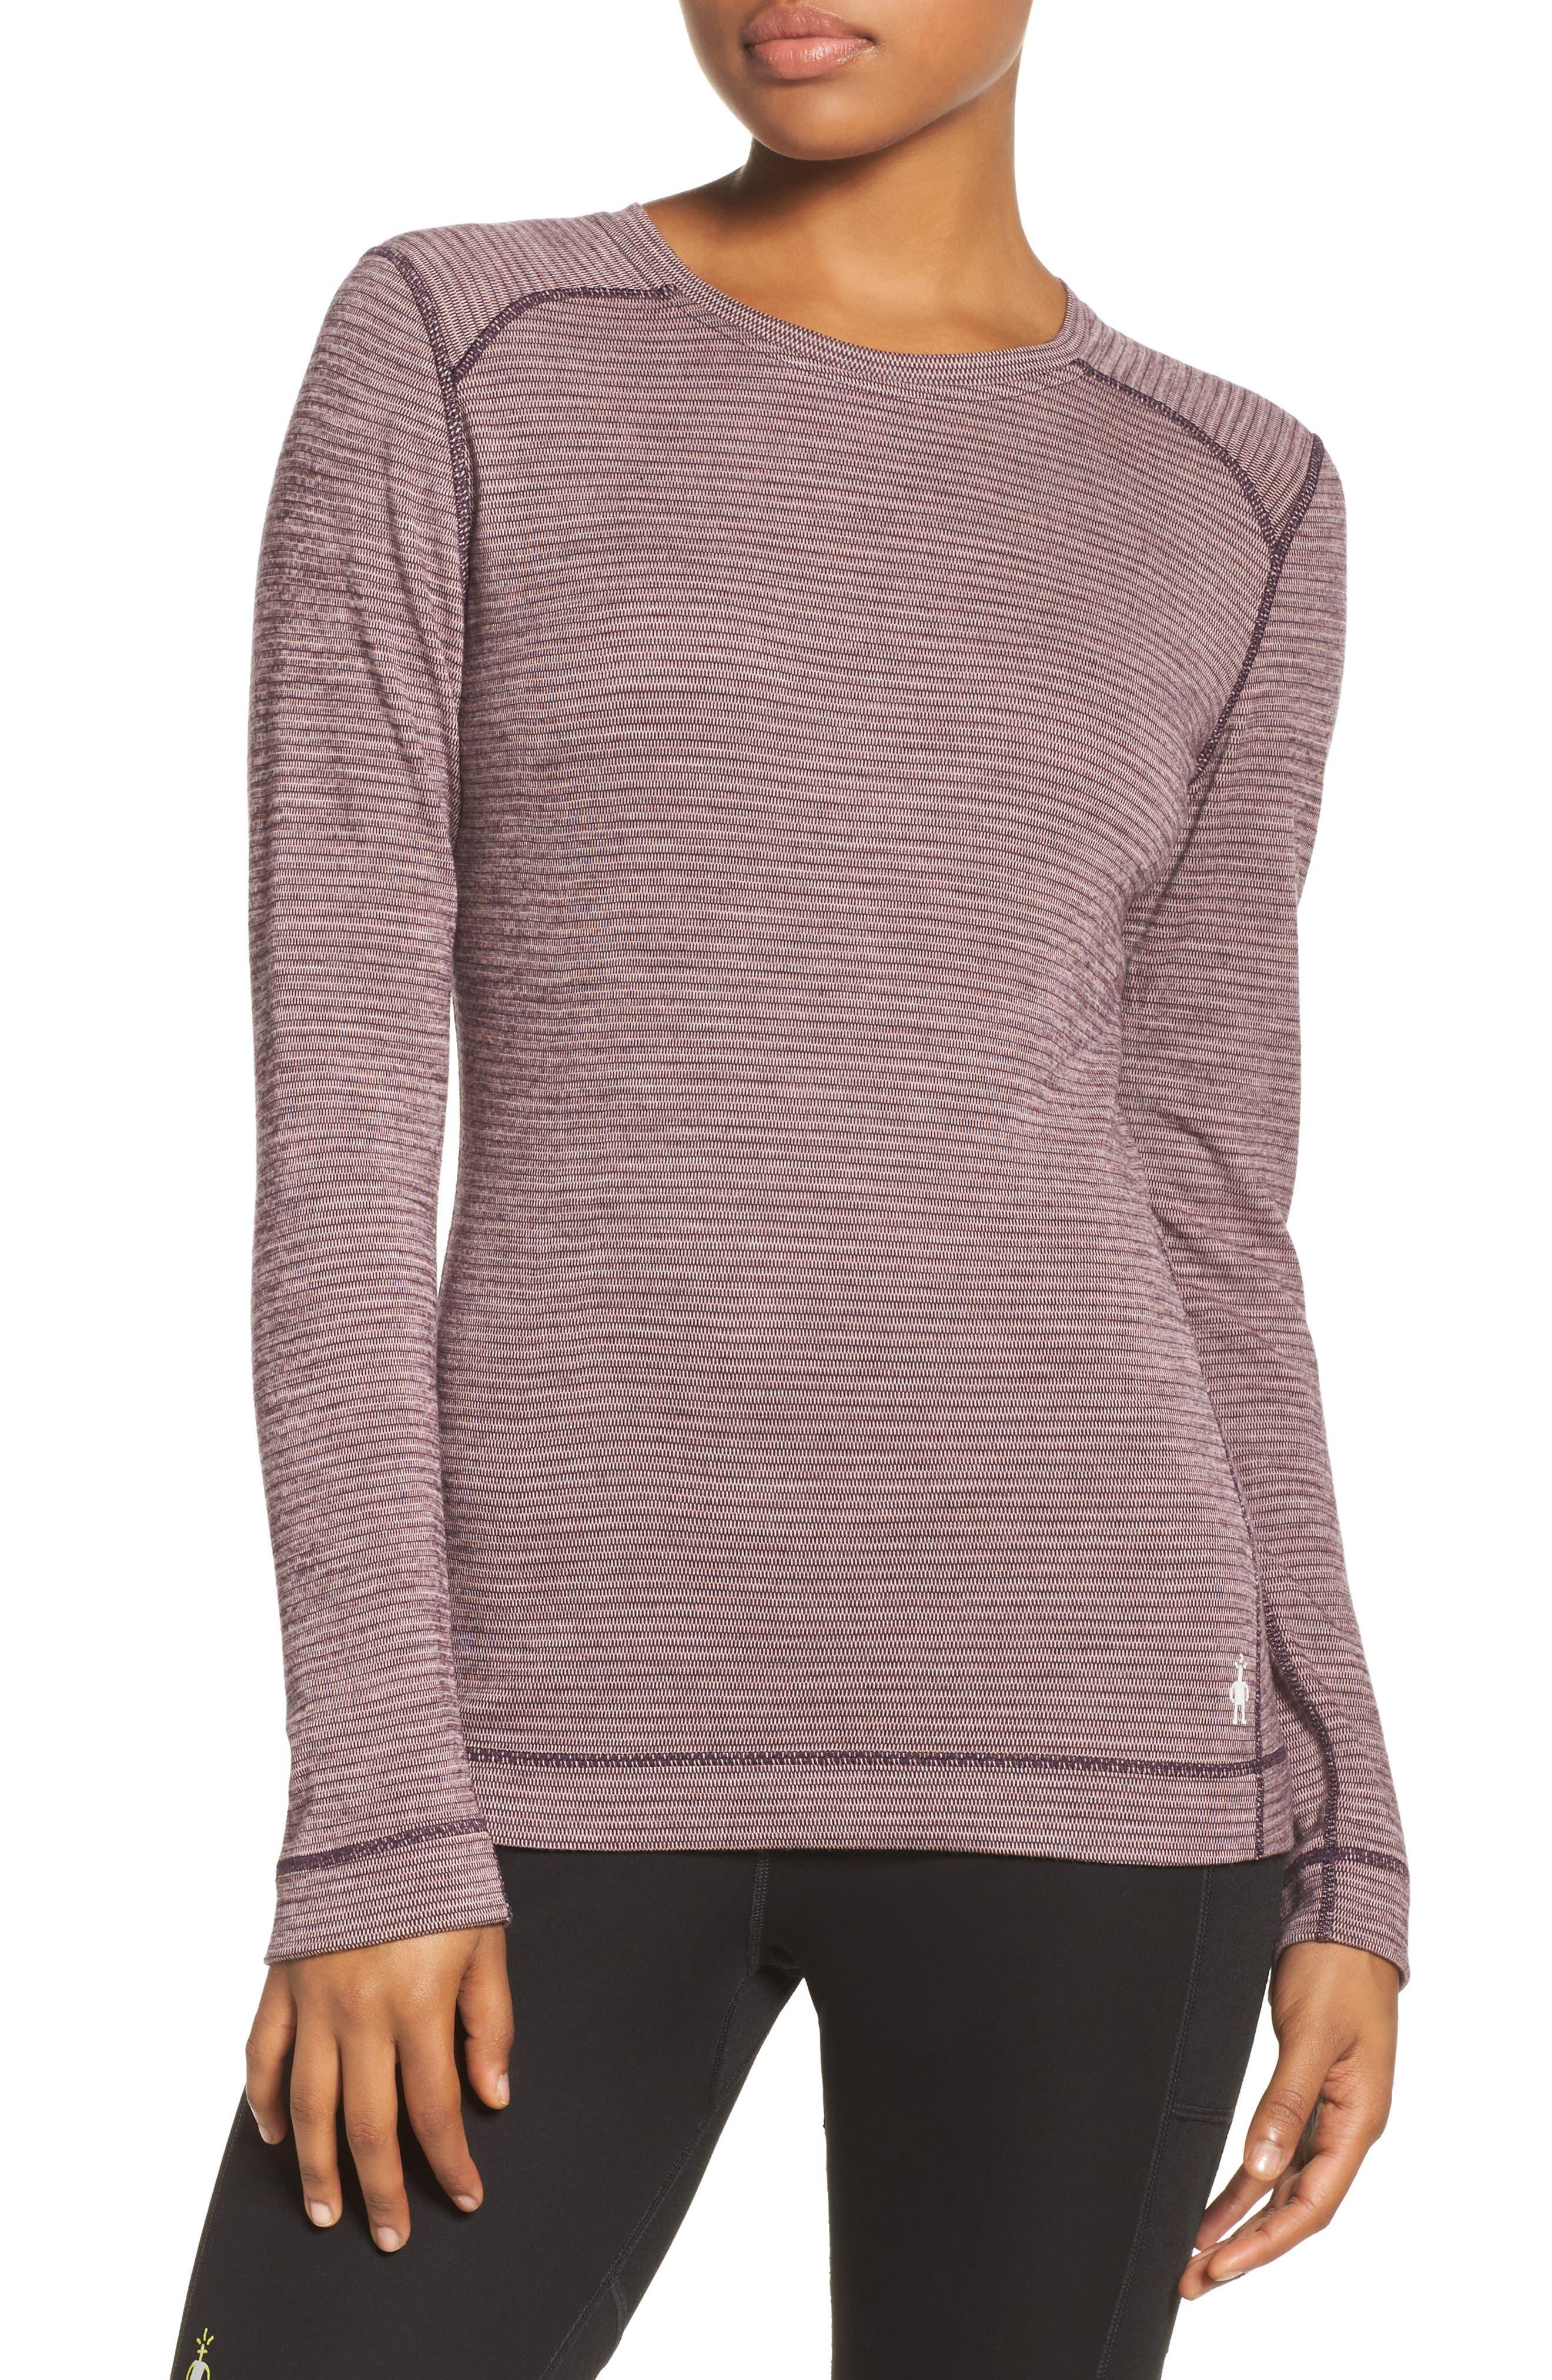 Merino Wool 250 Base Layer Top,                         Main,                         color, Bordeaux